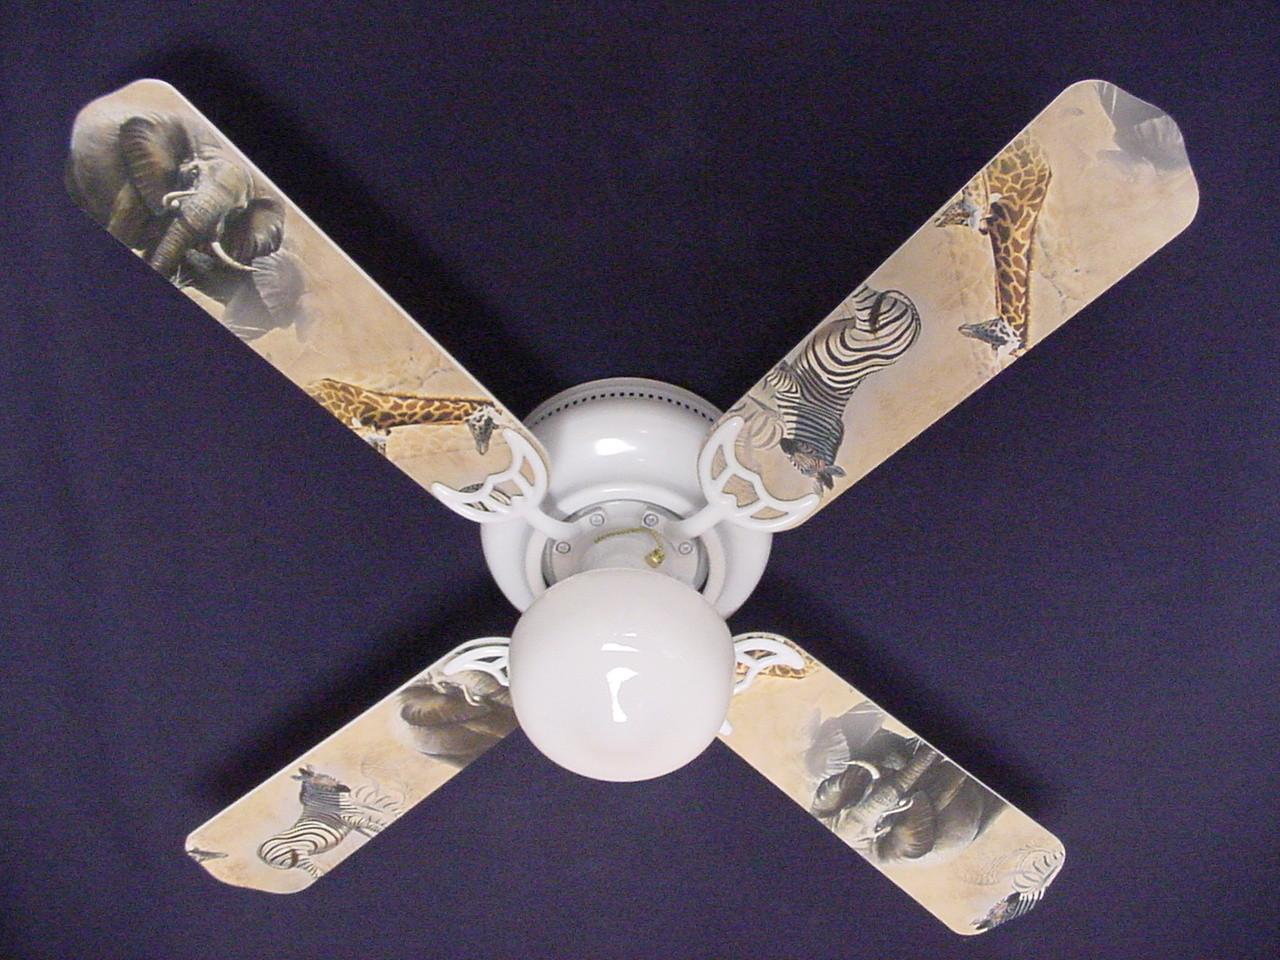 Pictures of Zebra Ceiling Fan